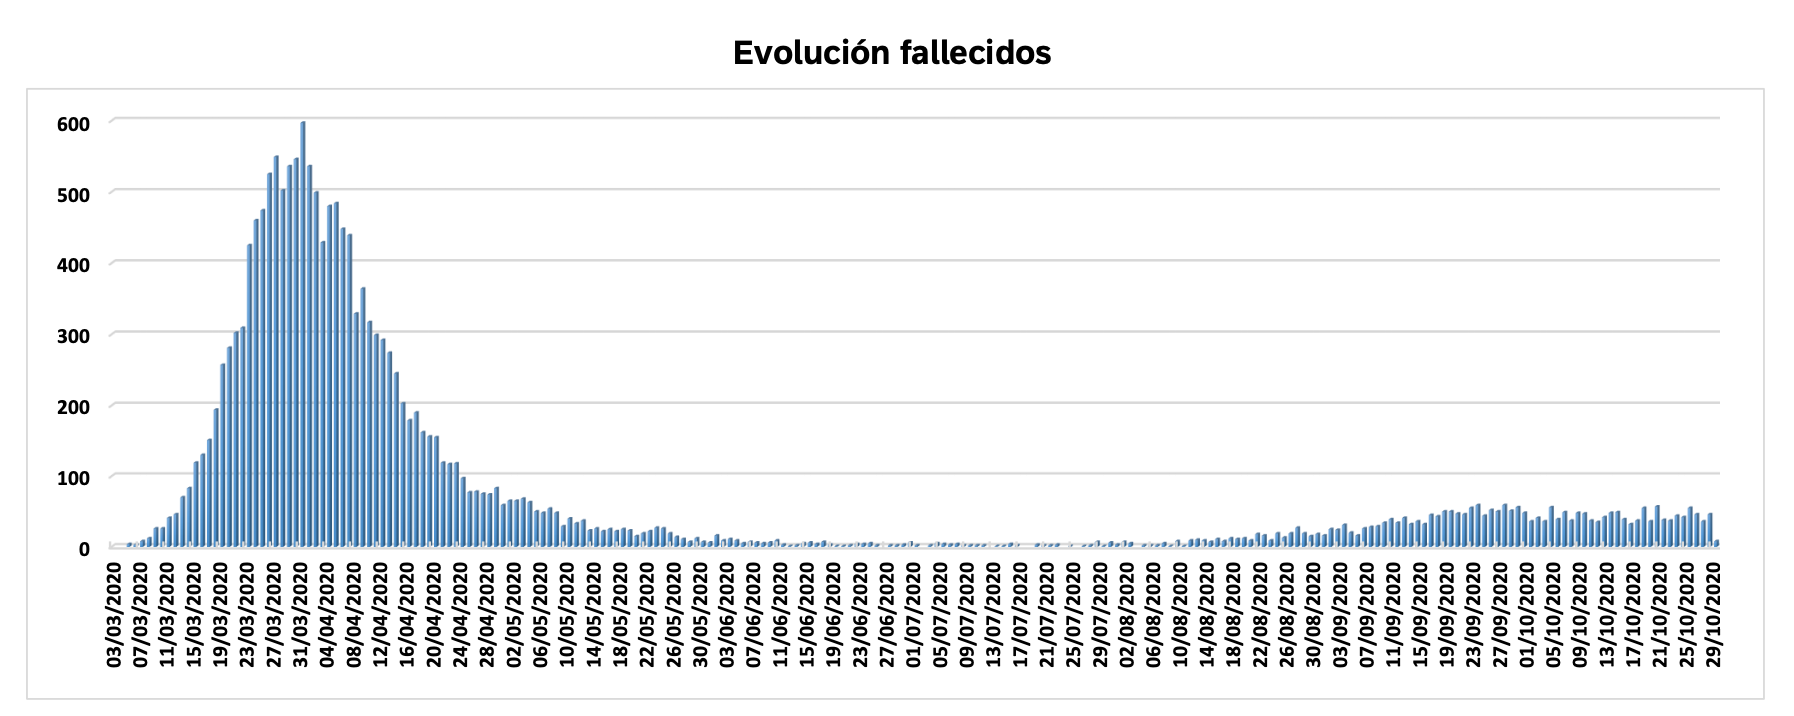 2-evolucion-fallecidos-covid-19-madrid-primera-segunda-ola.png